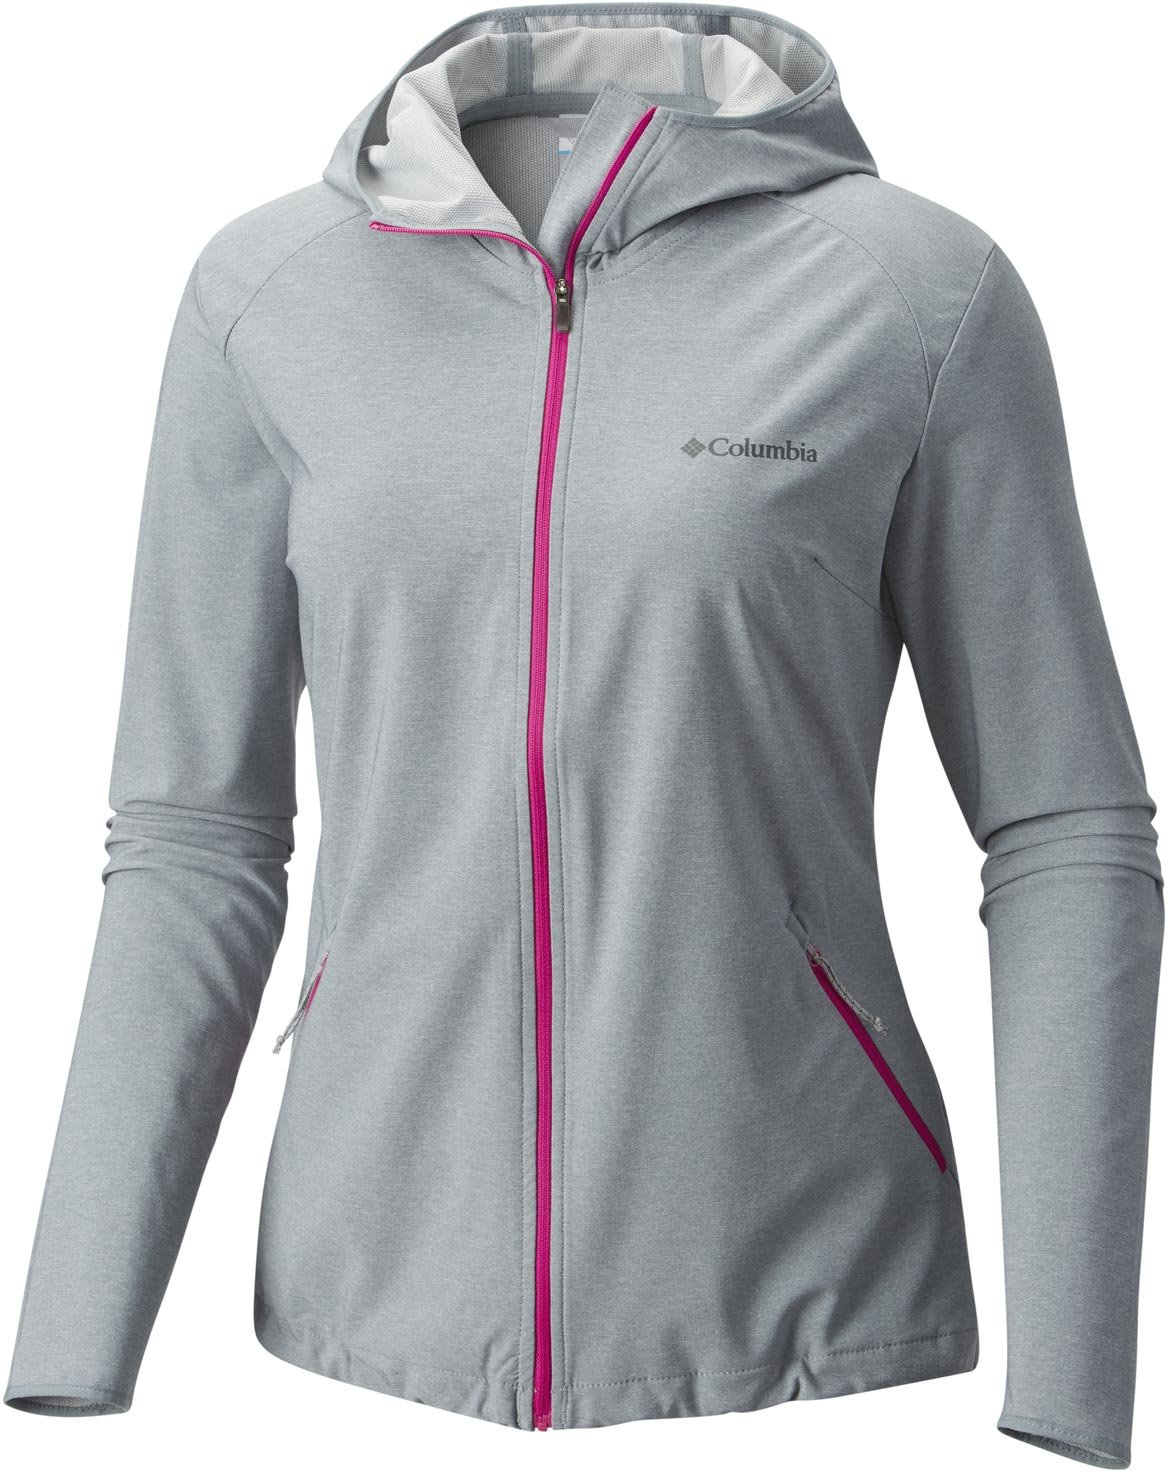 Columbia Heather Canyon Softshell Jacket L